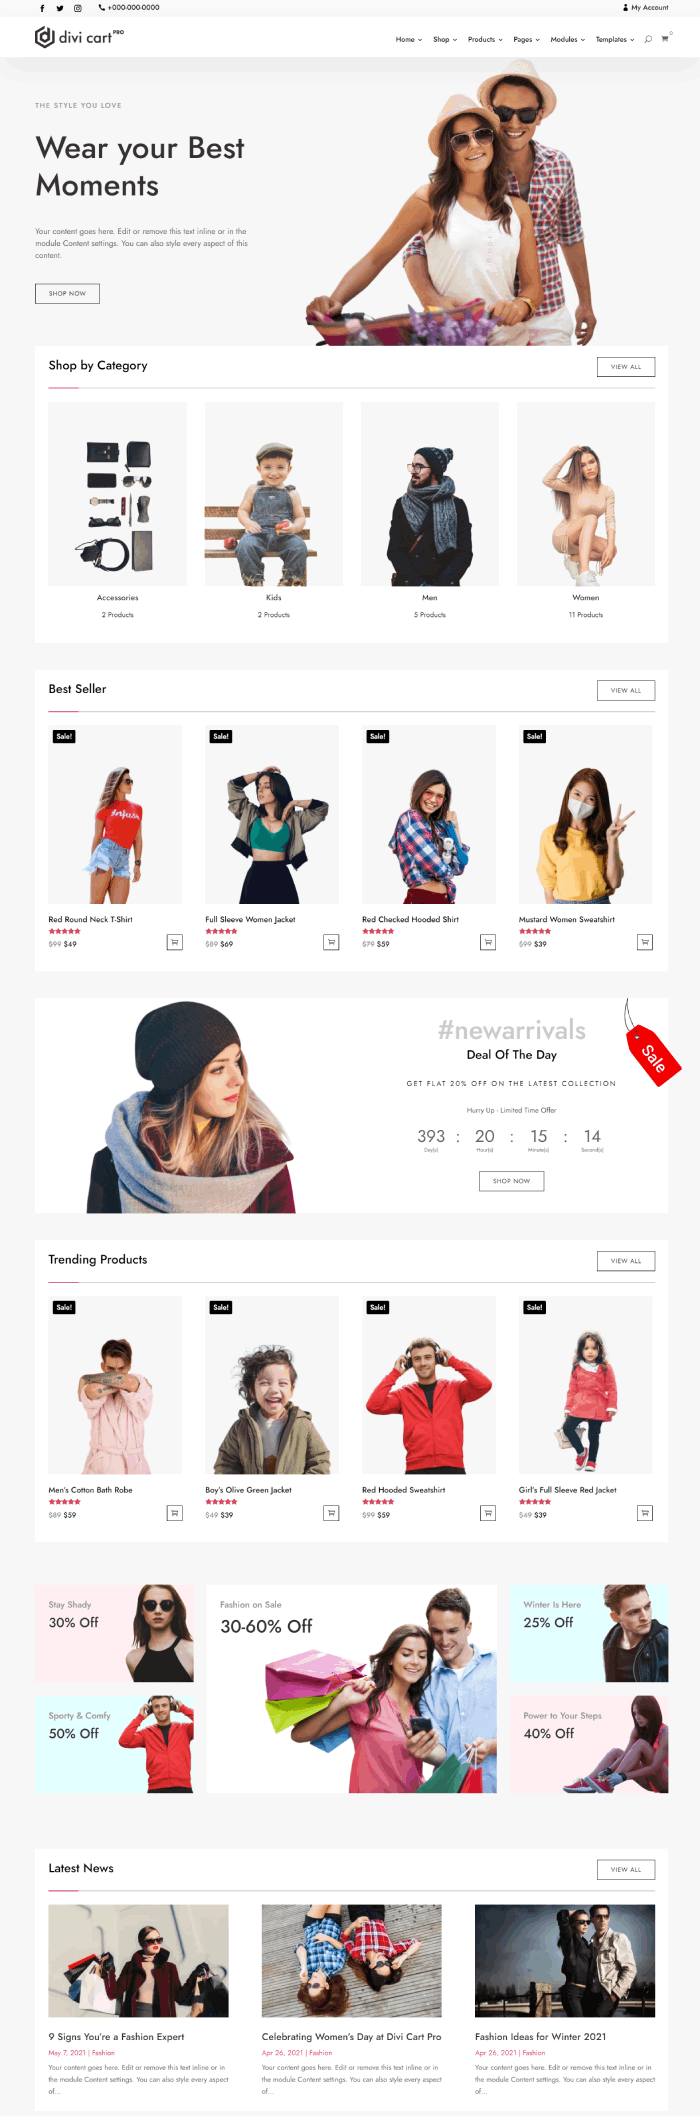 Divi Cart Pro modern fashion homepage